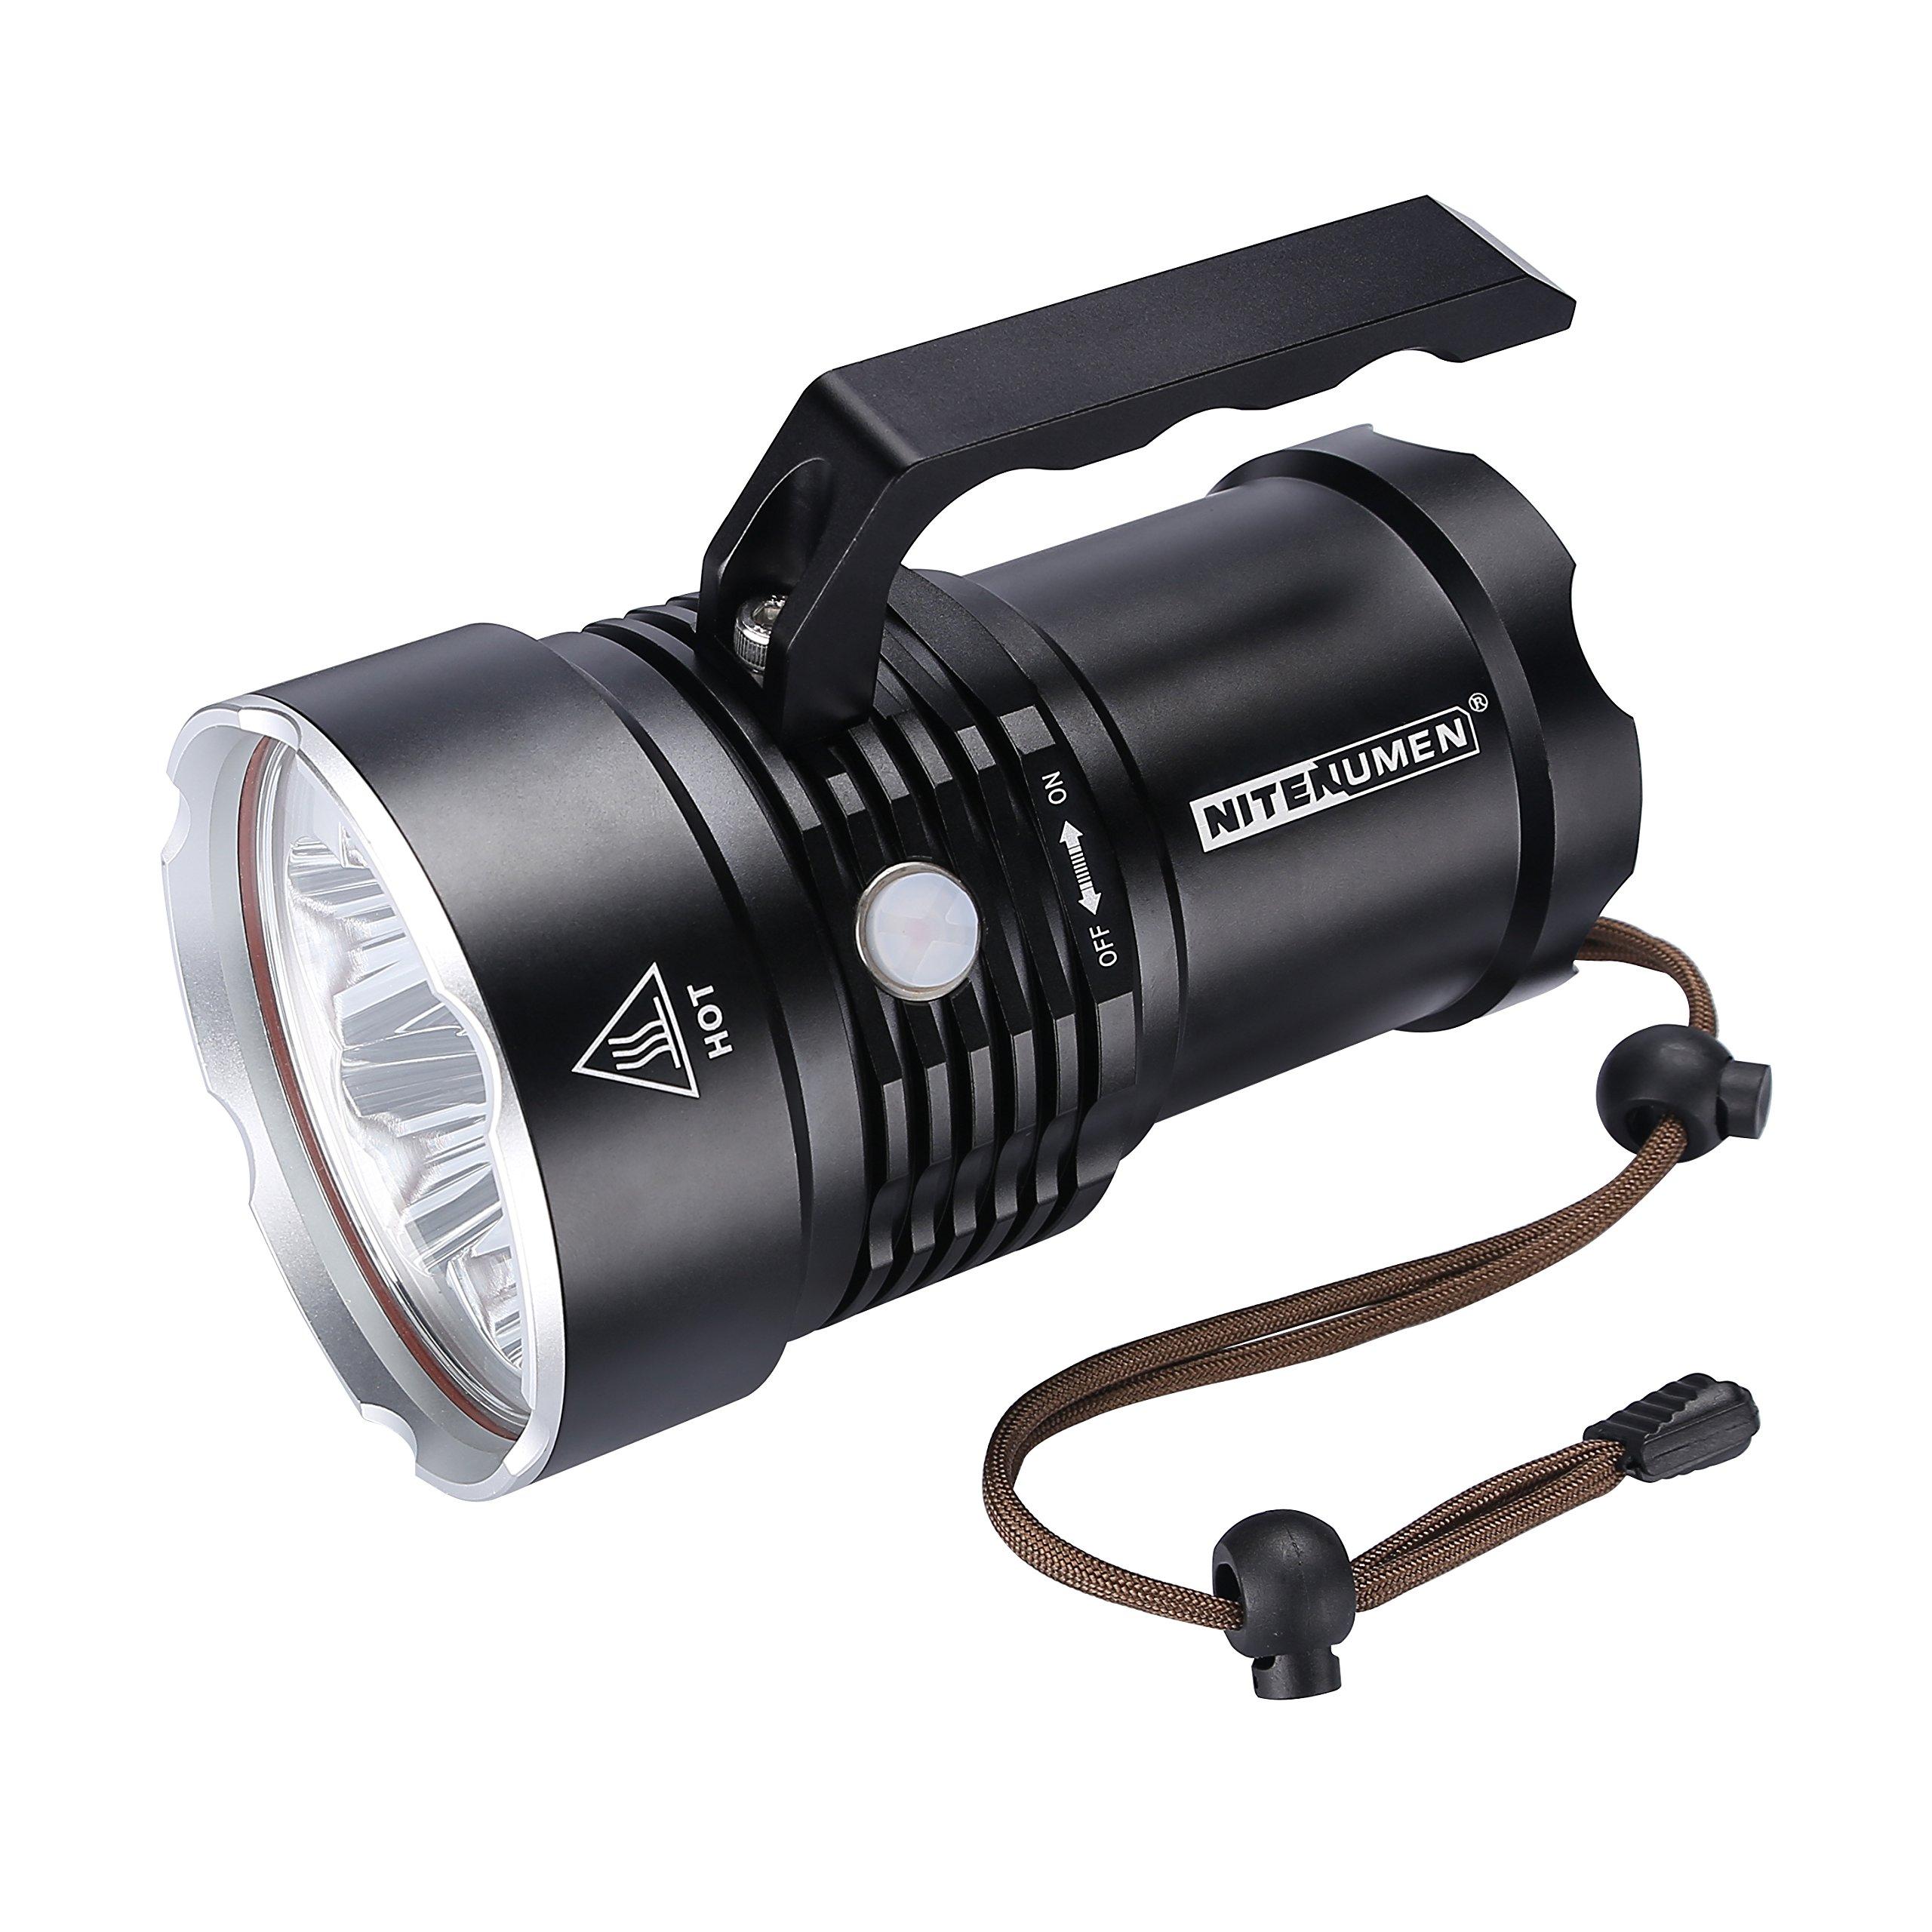 Nitenumen RT6 Powerful Flashlight Spotlight Waterproof Searchlight 6 x Cree XM-L L2 LED 4800 Lumens Spotlight Torch Aluminum Alloy Flashlight,USB Rechargeable 4 x 18650 3400 mAh battery/Lanyard